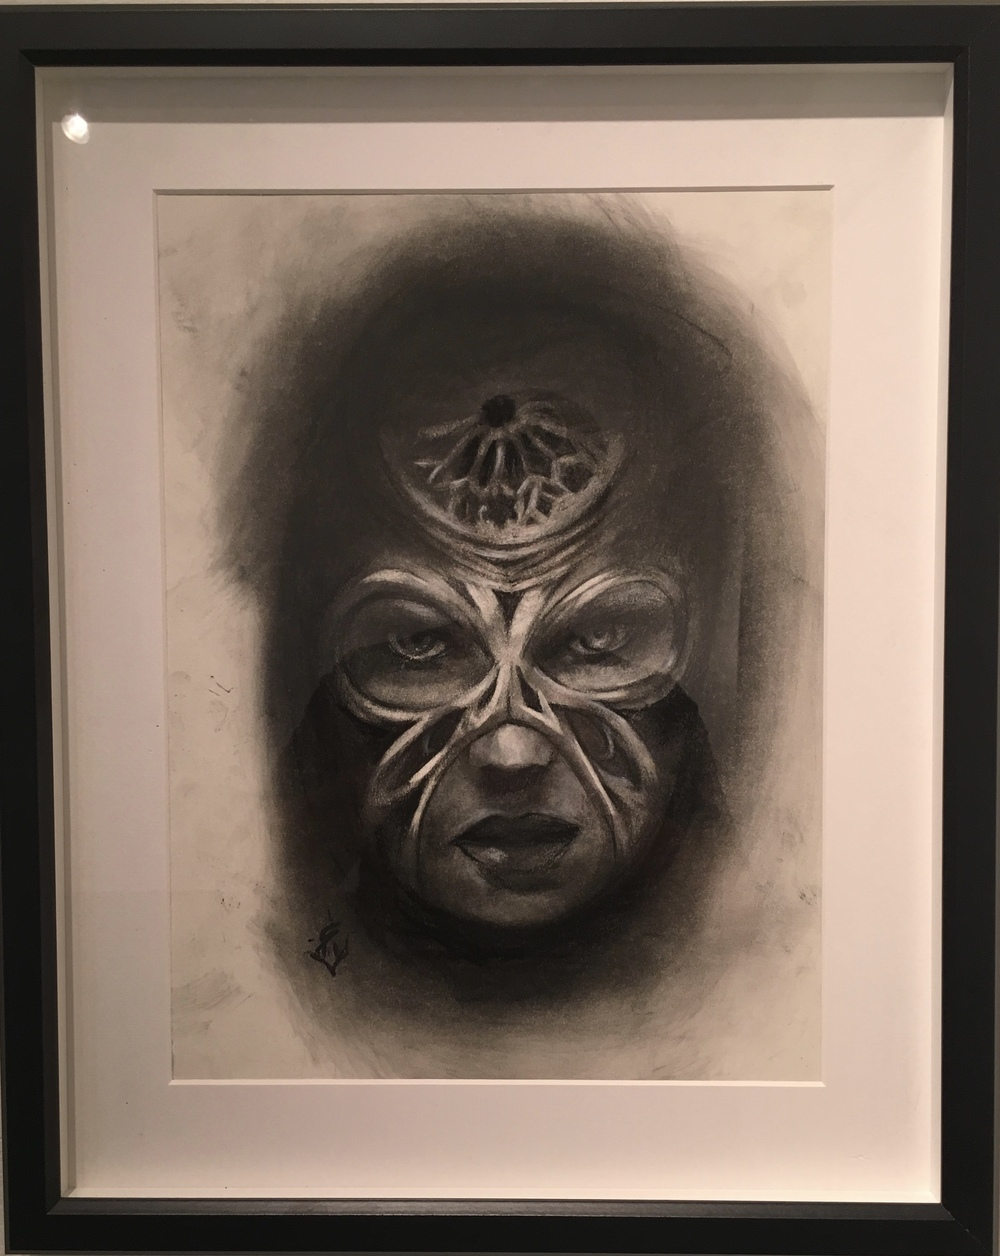 La Mirada by Ezra One